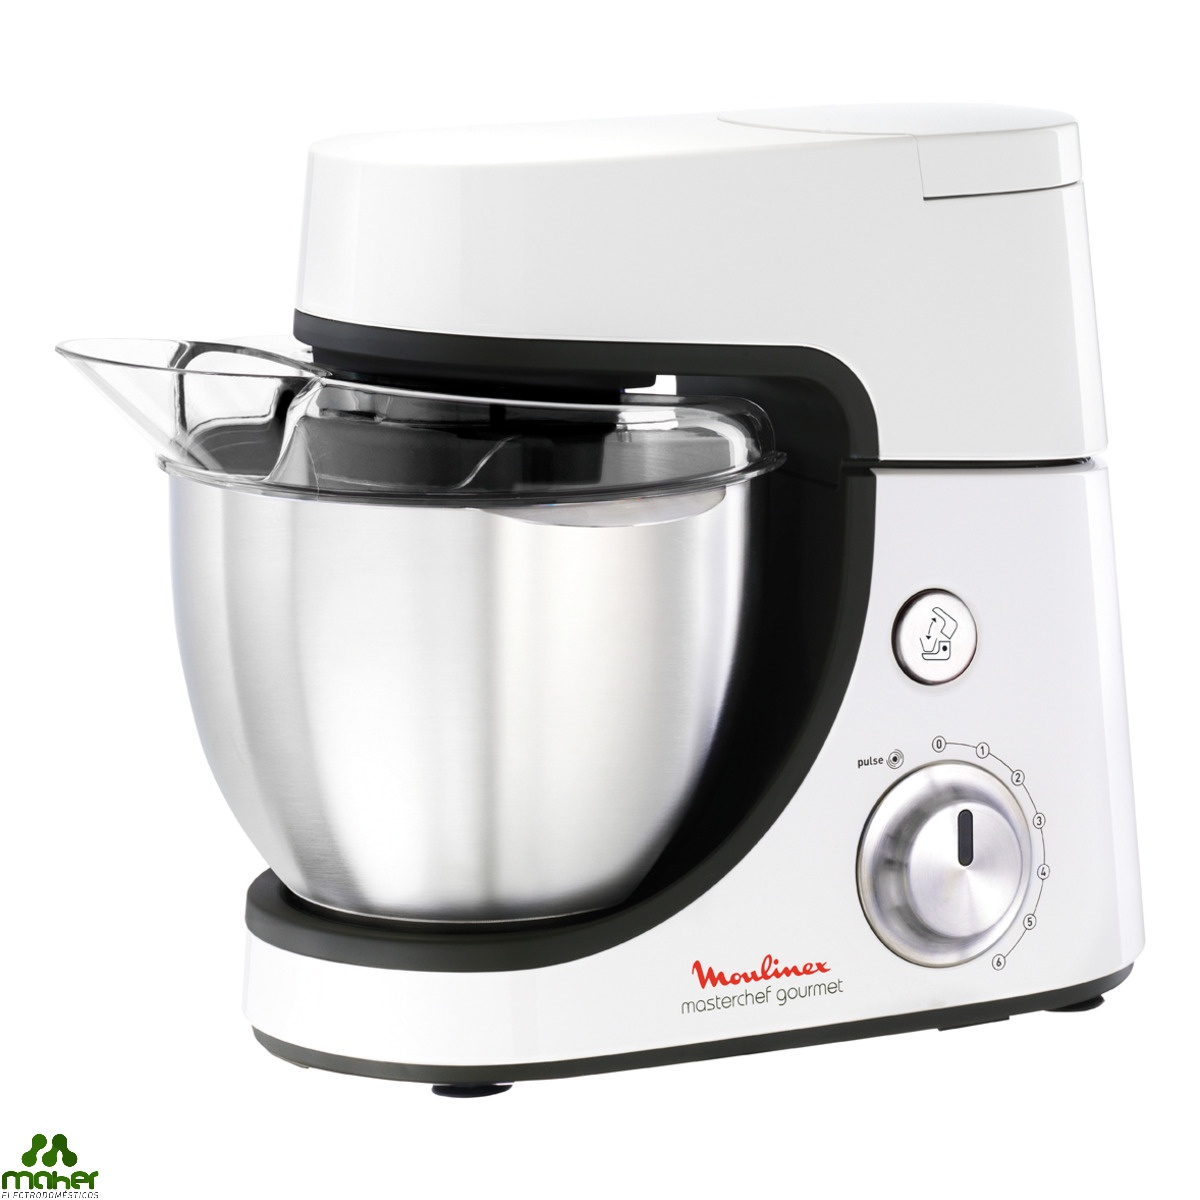 Robot de cocina mastercheff gourmet moulinex qa5081b for Moulinex robot cocina